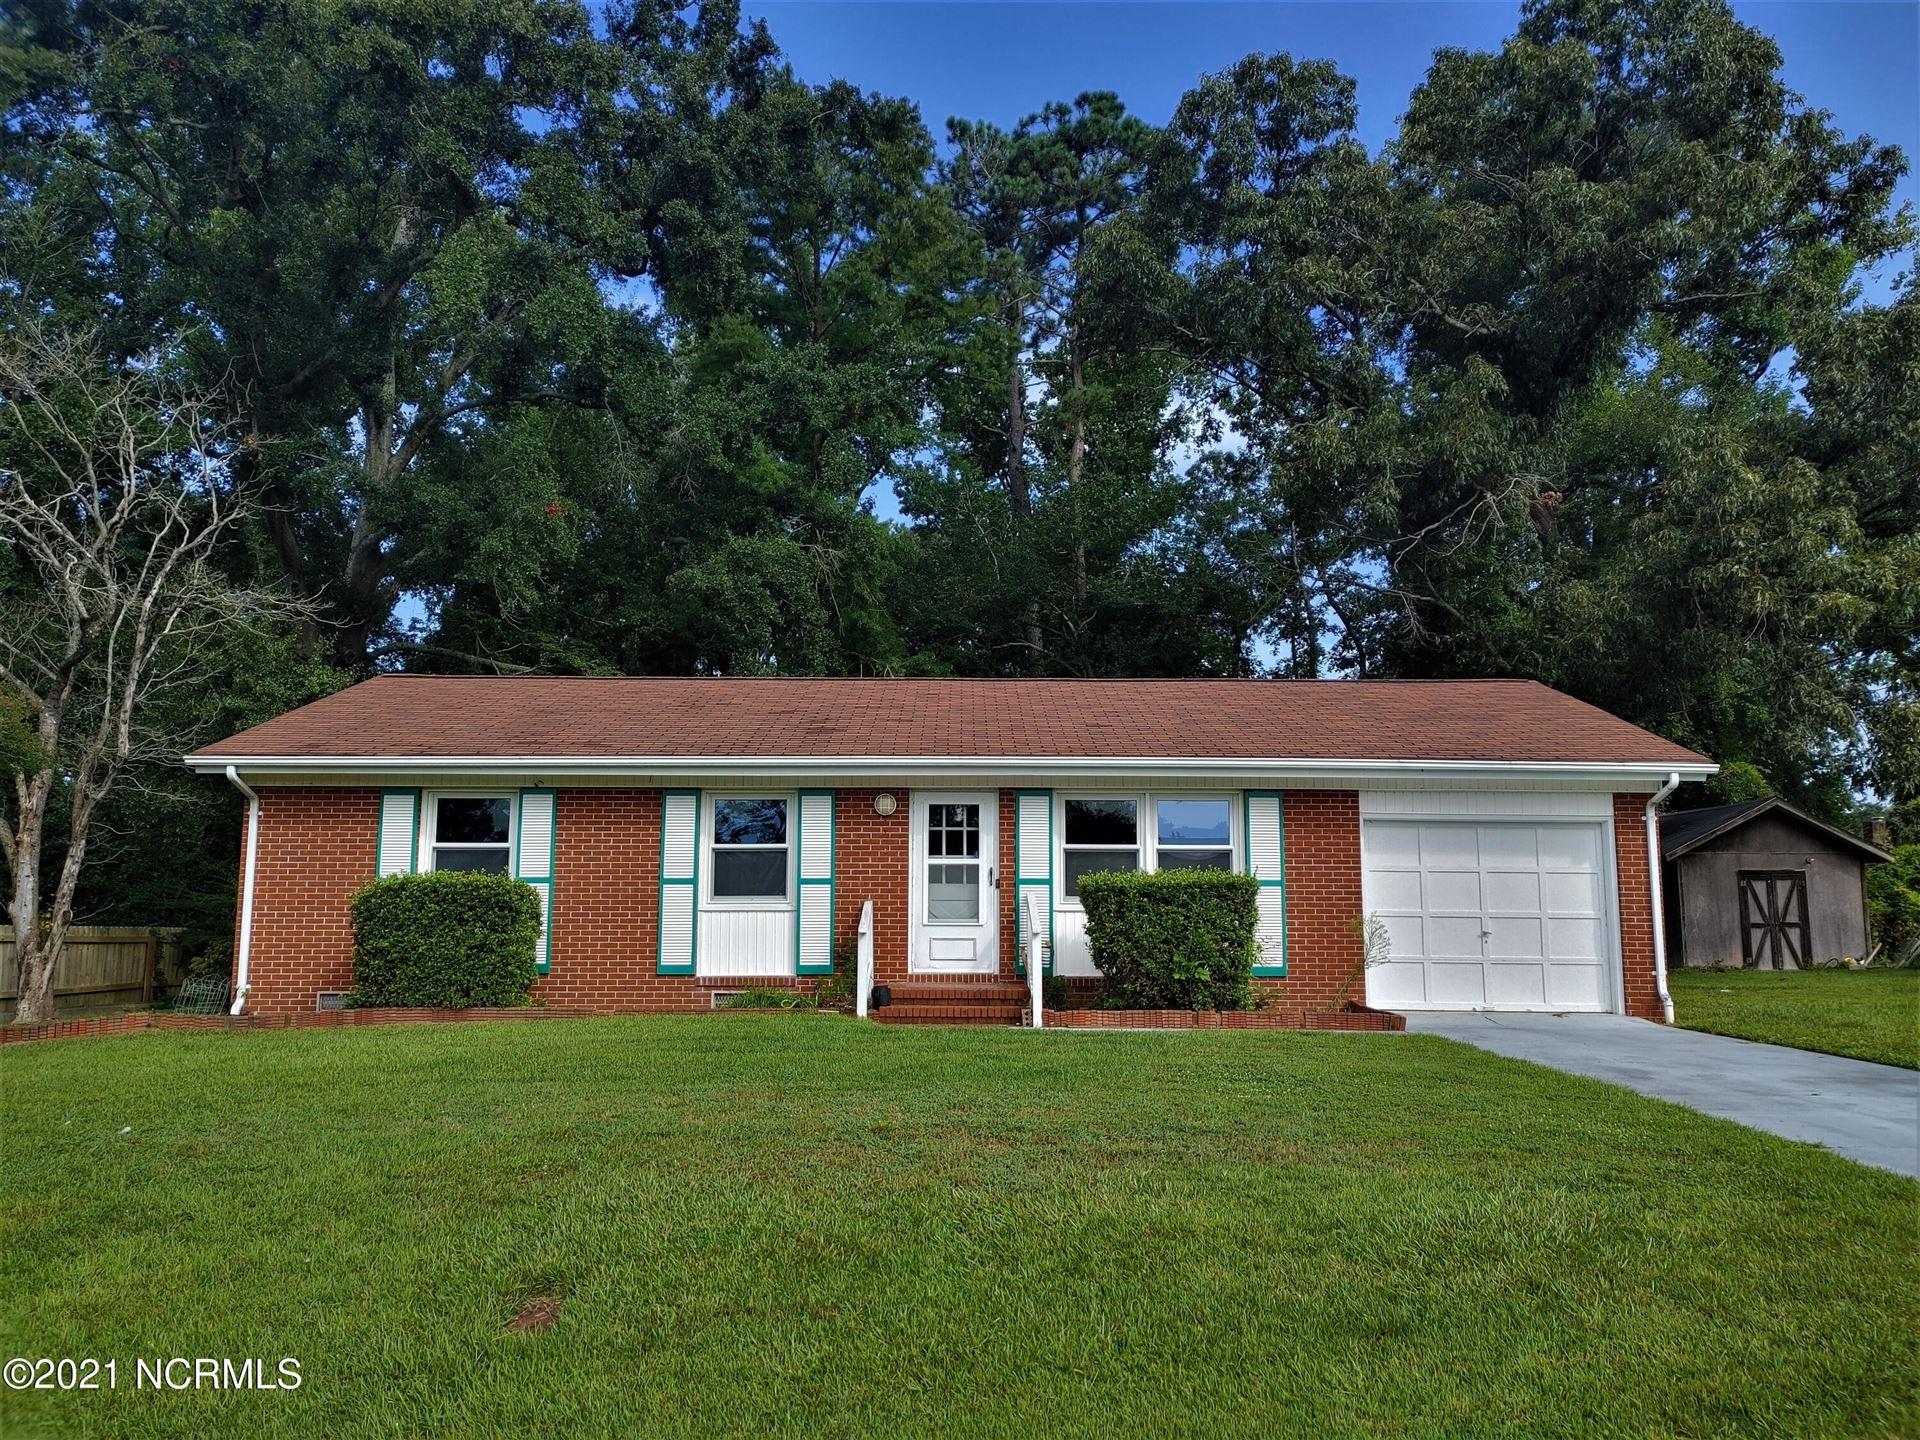 Photo of 139 Greencrest Circle, Jacksonville, NC 28540 (MLS # 100288032)